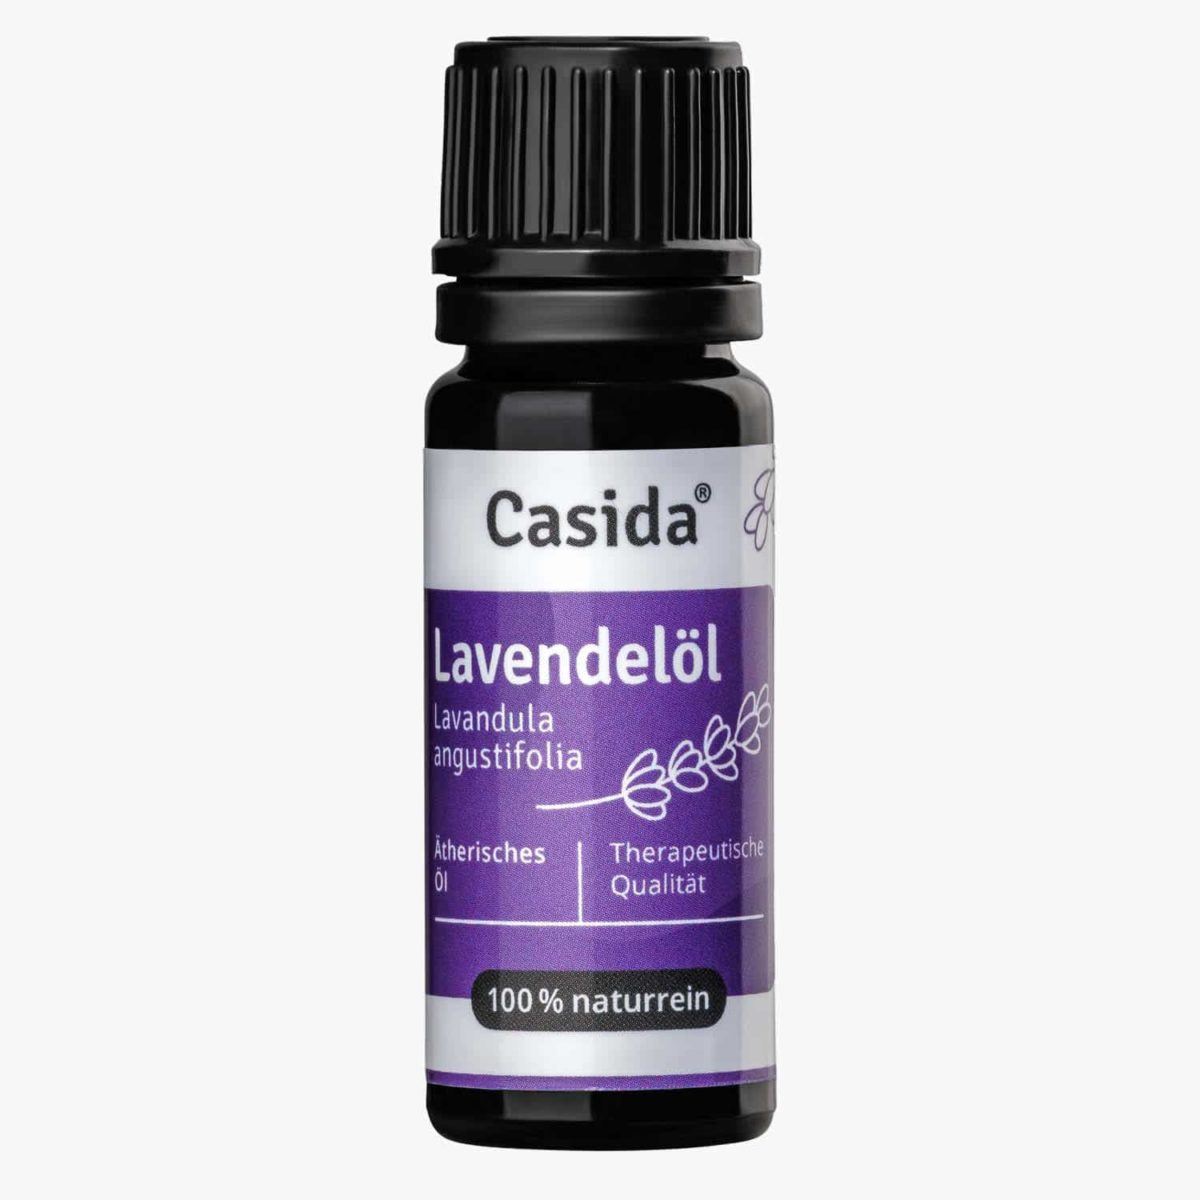 Casida Lavendelöl naturrein 10 ml PZN DE 15880722 PZN AT 5178553 PZN CH 7779584 UVP 9,95 € EAN 4260518460437 Apotheke ätherisches Öl